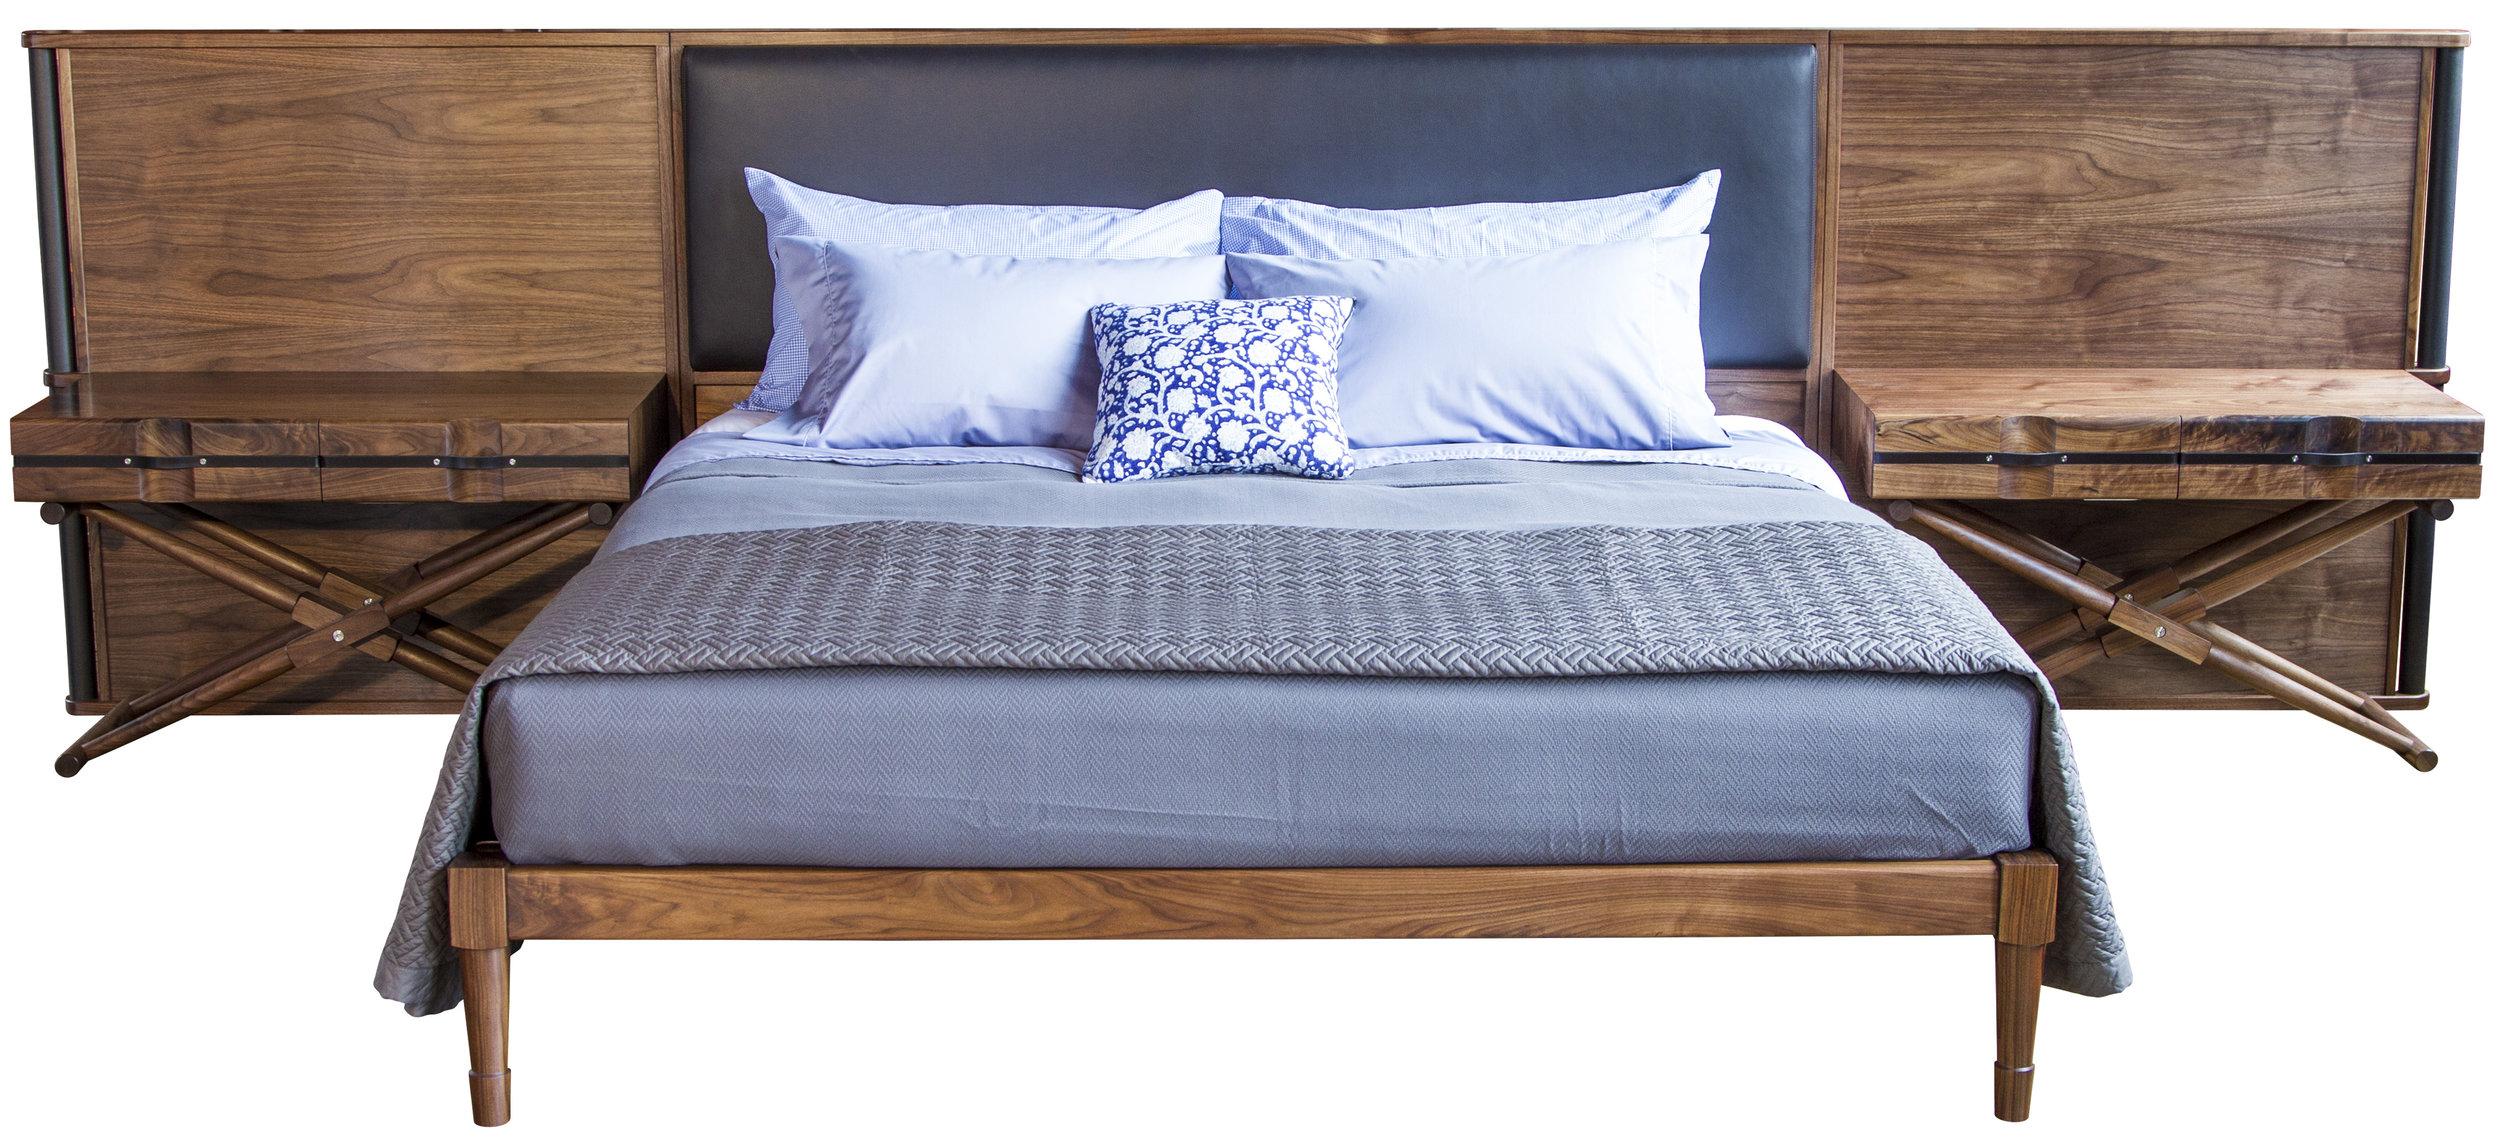 Jasper Bed and Headboard